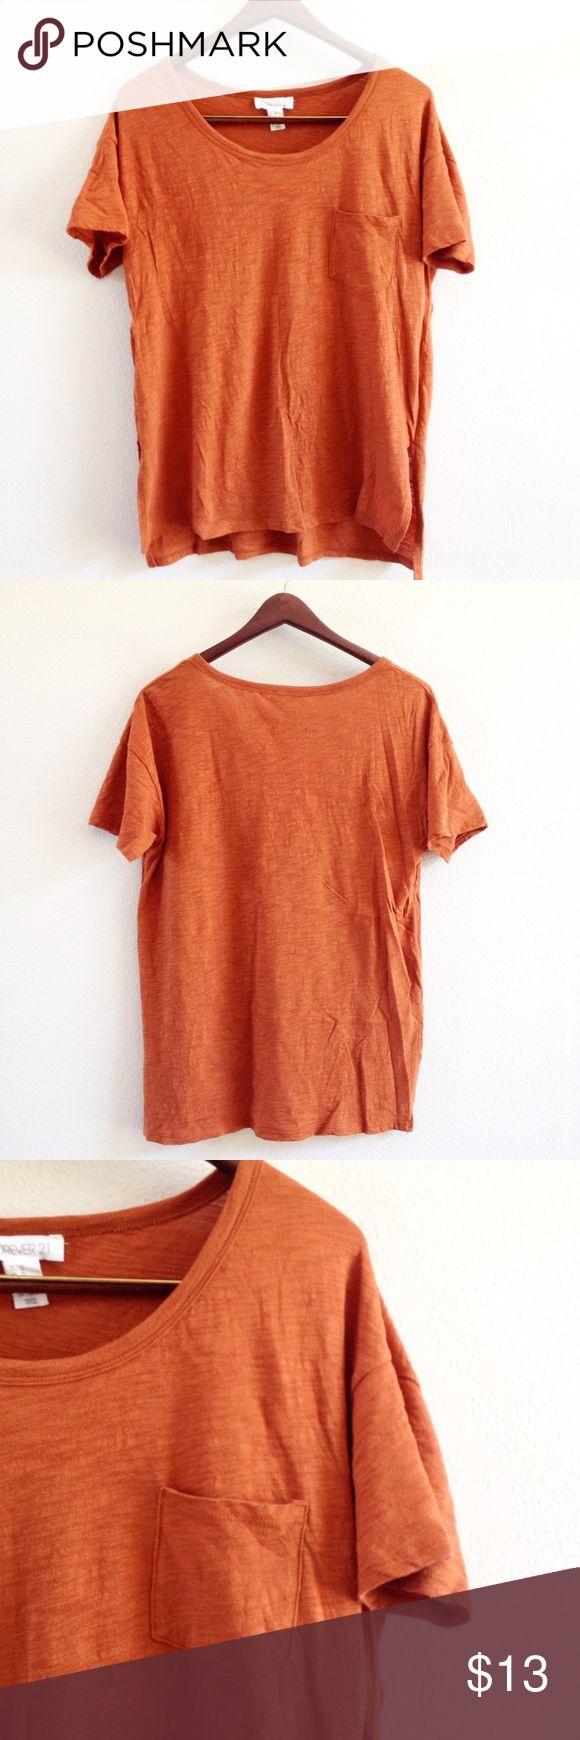 "FLASH SALE burnt orange tee offers welcome size medium burnt orange t shirt with pocket. bust: 21"", front length: 24"", back length: 26.5"".  •460045•  instagram: @xomandysue Forever 21 Tops Tees - Short Sleeve"